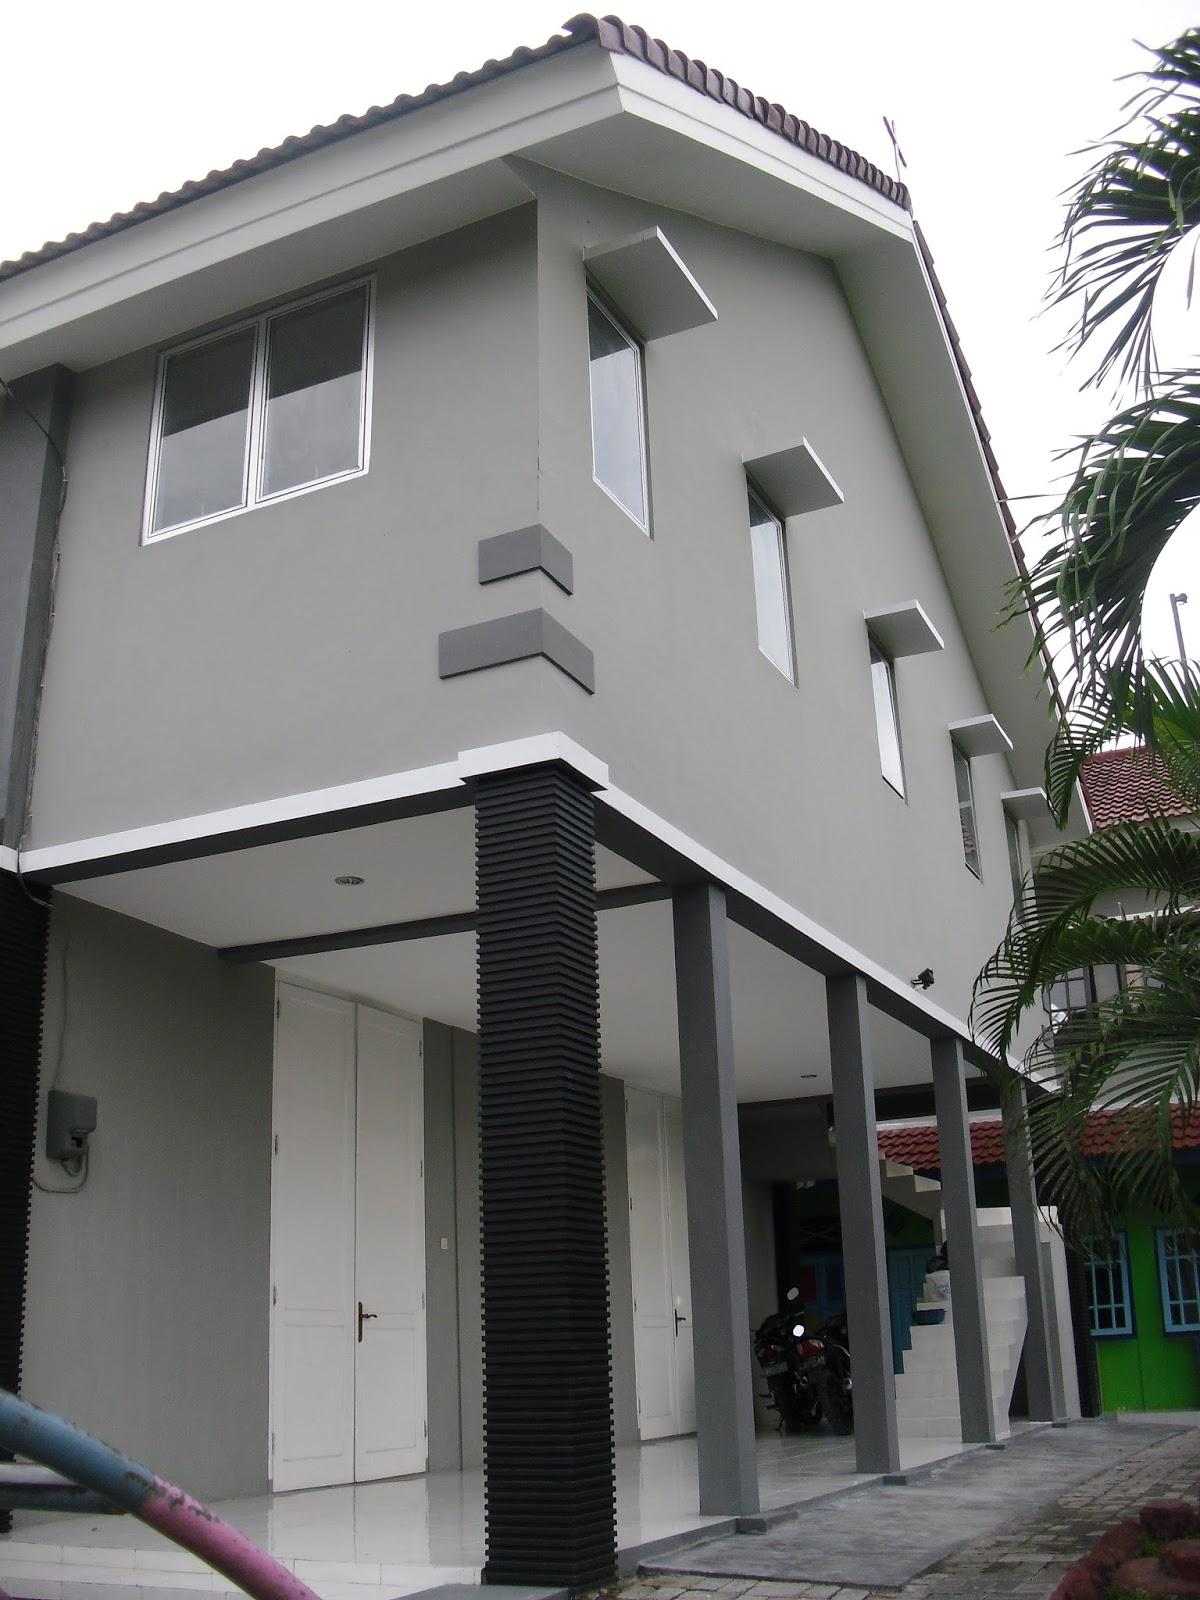 Gpdi Kristus Keselamatan Gedung Citra Raya Surabaya Kota